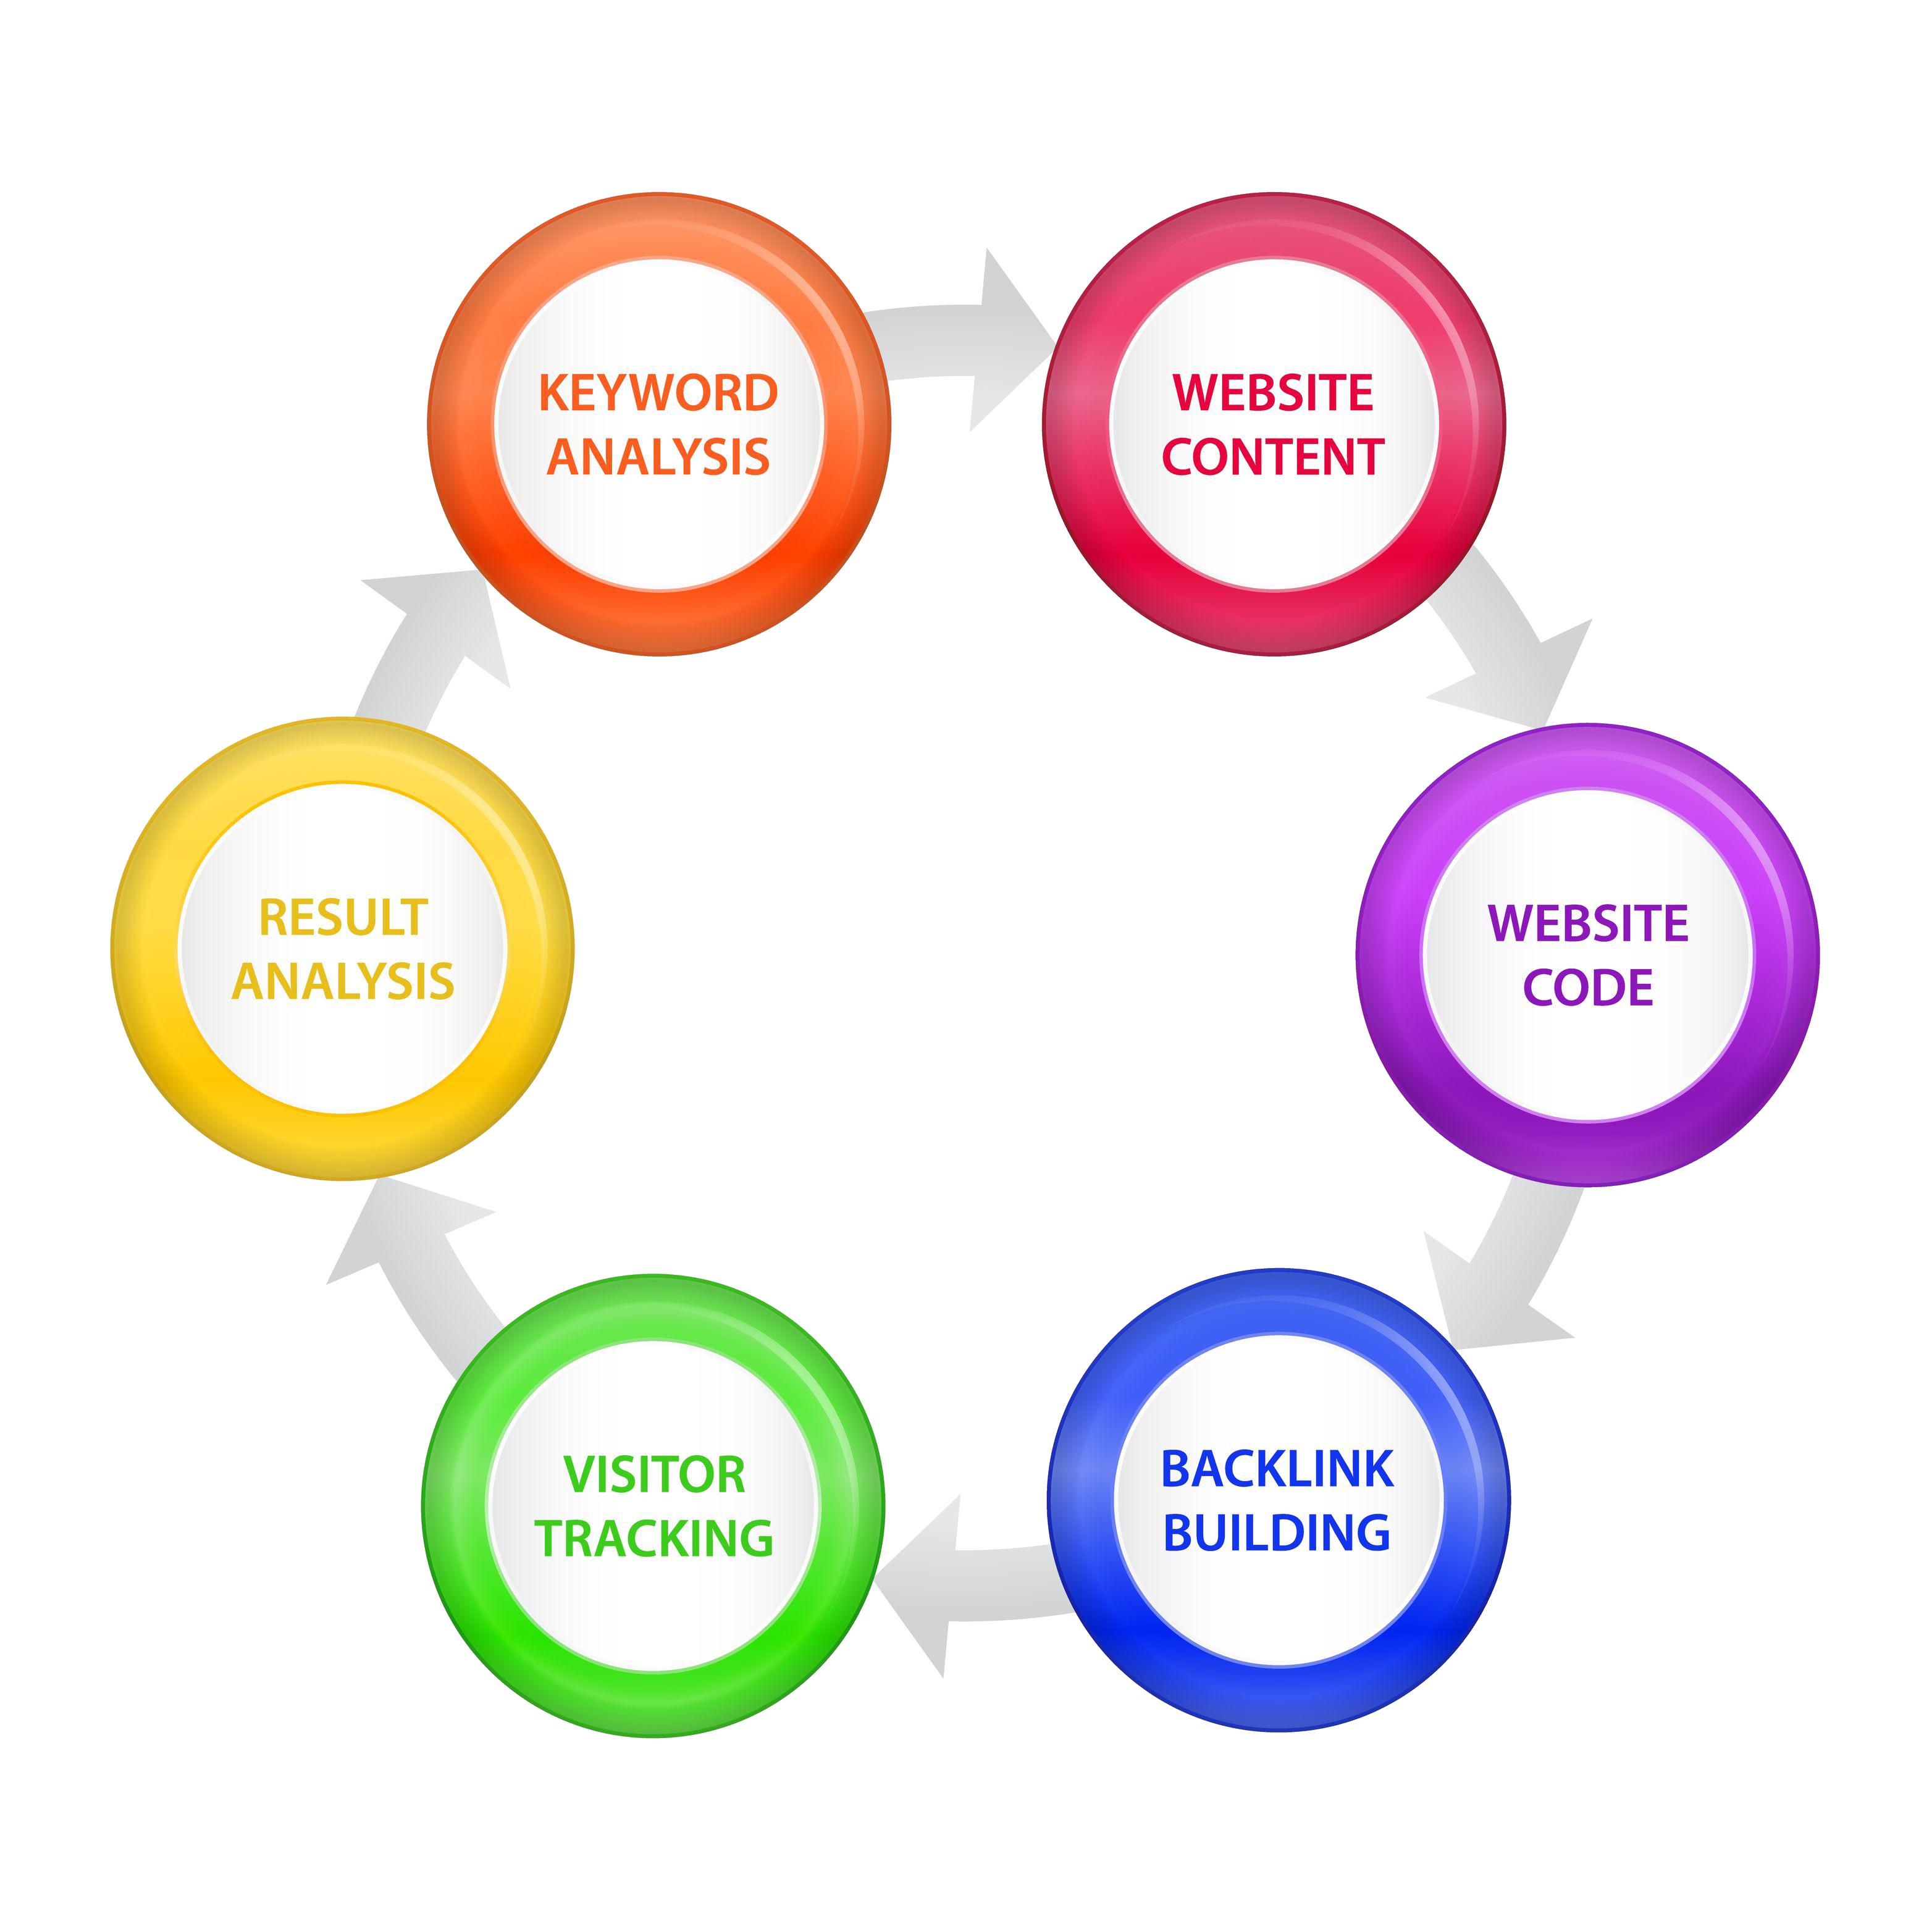 Digital Marketing | SEO Services | SMO Services | Ecommerce SEO